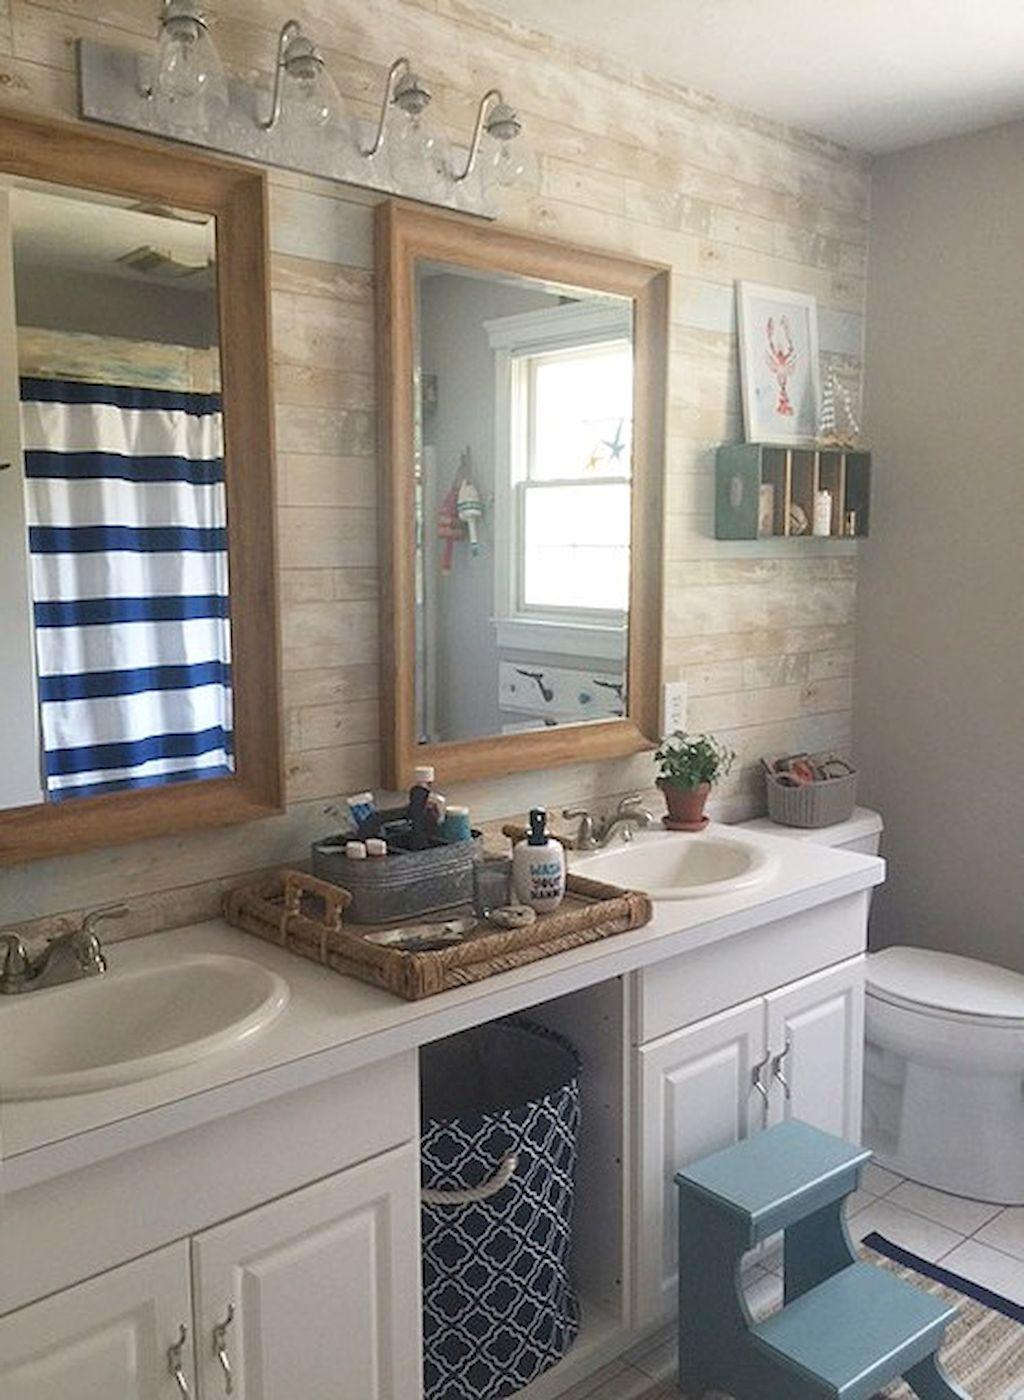 30 amazing coastal nautical bathroom remodel ideas 5 on bathroom renovation ideas modern id=19985